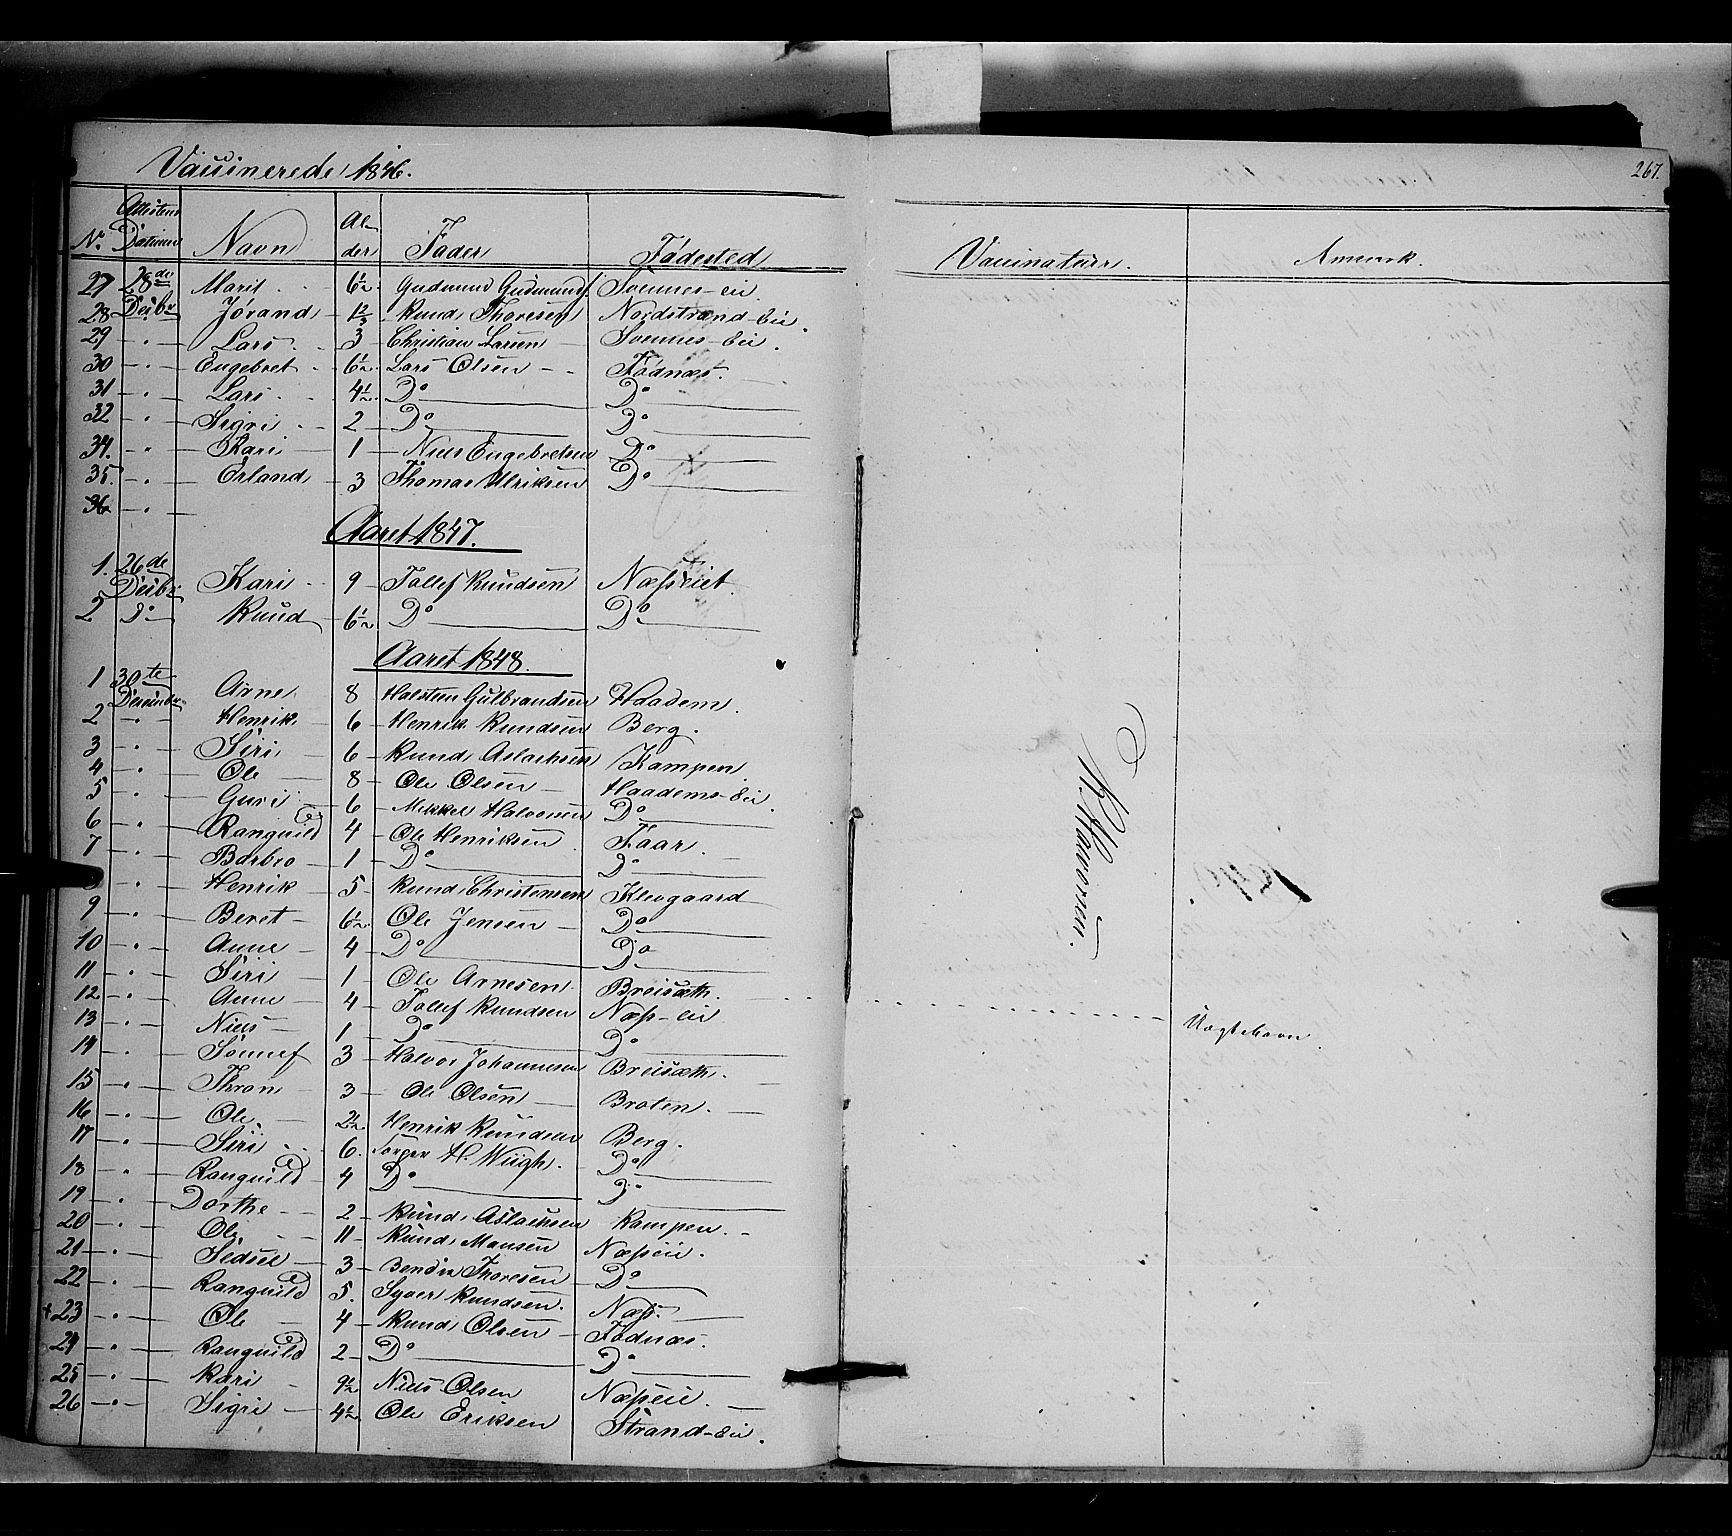 SAH, Nord-Aurdal prestekontor, Ministerialbok nr. 5, 1842-1863, s. 267